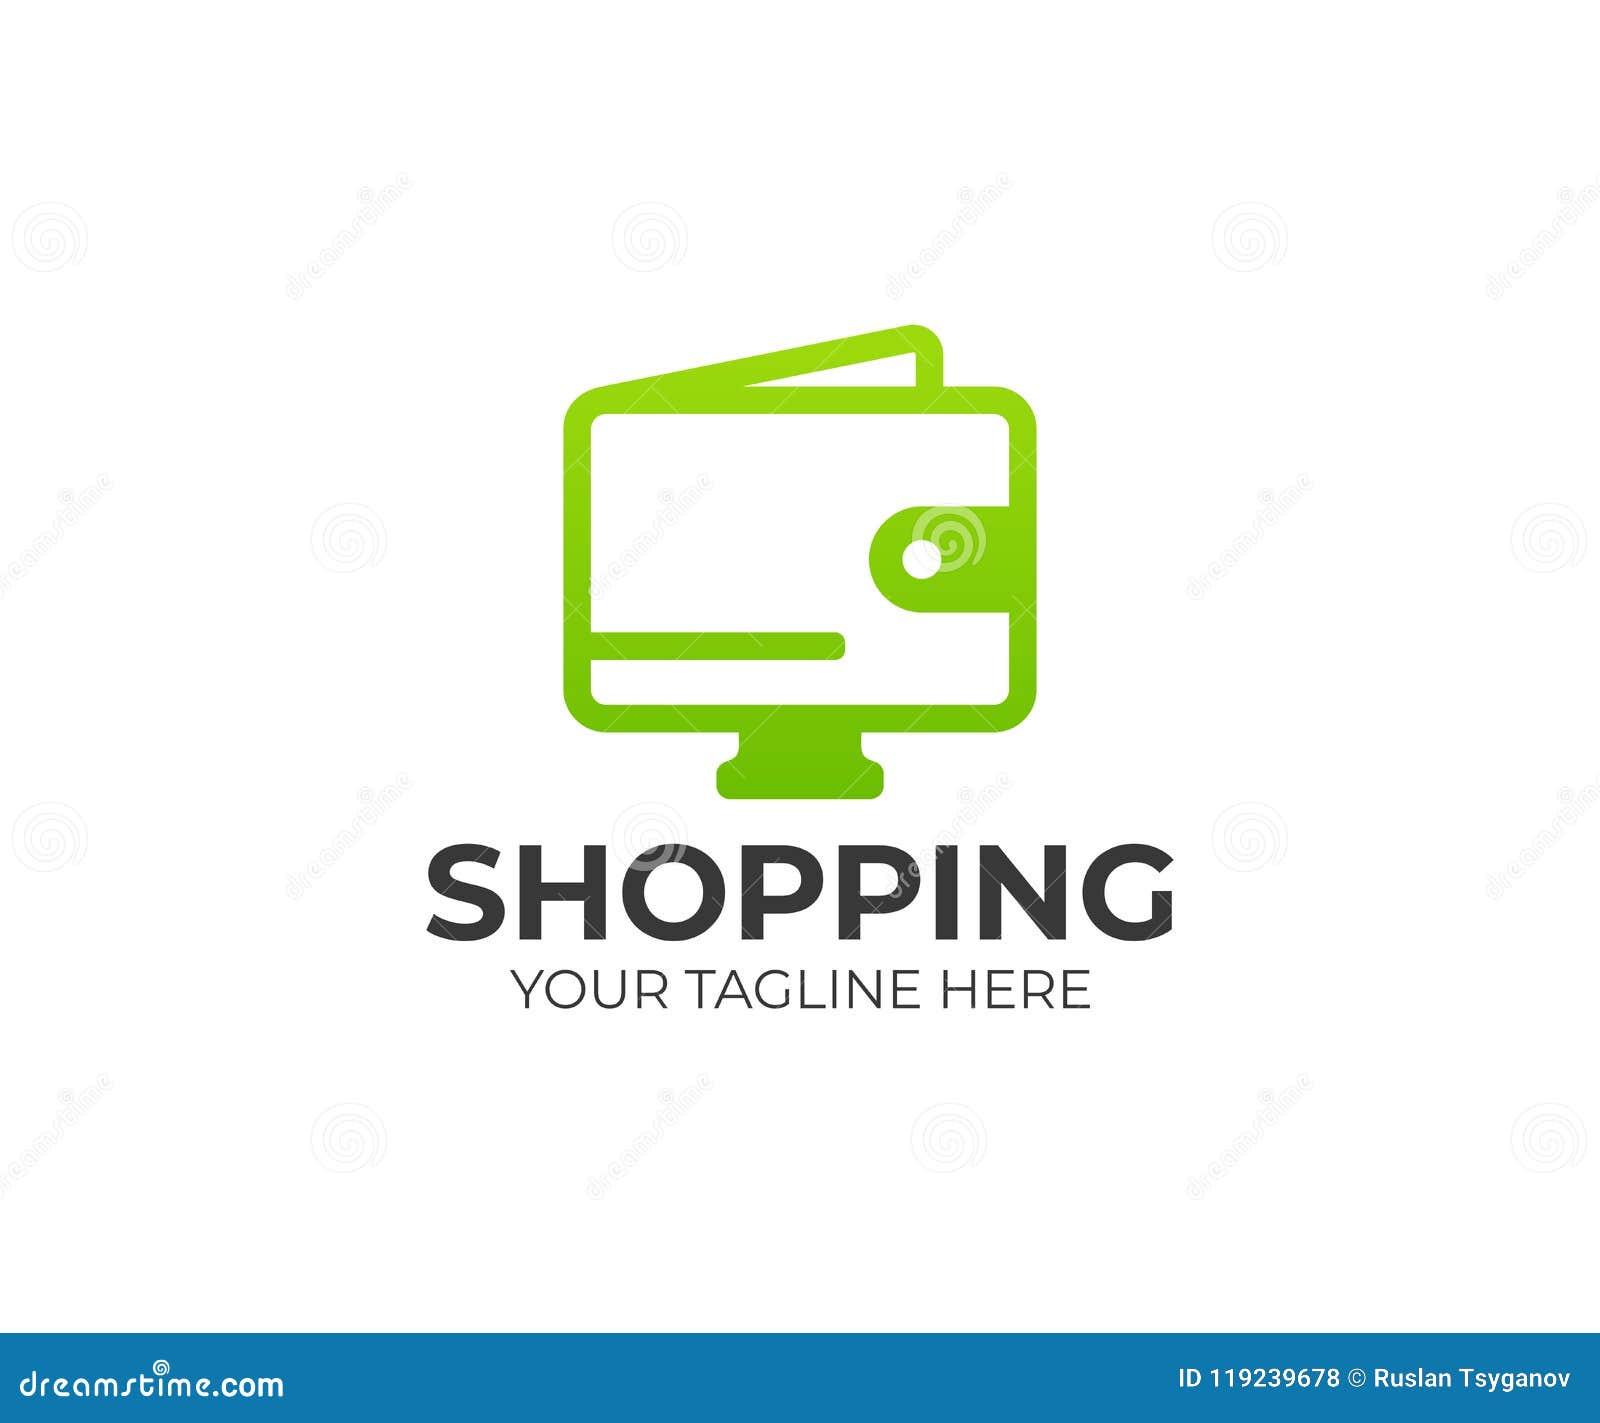 Online Shopping Logo Template Electronic Commerce Vector Design